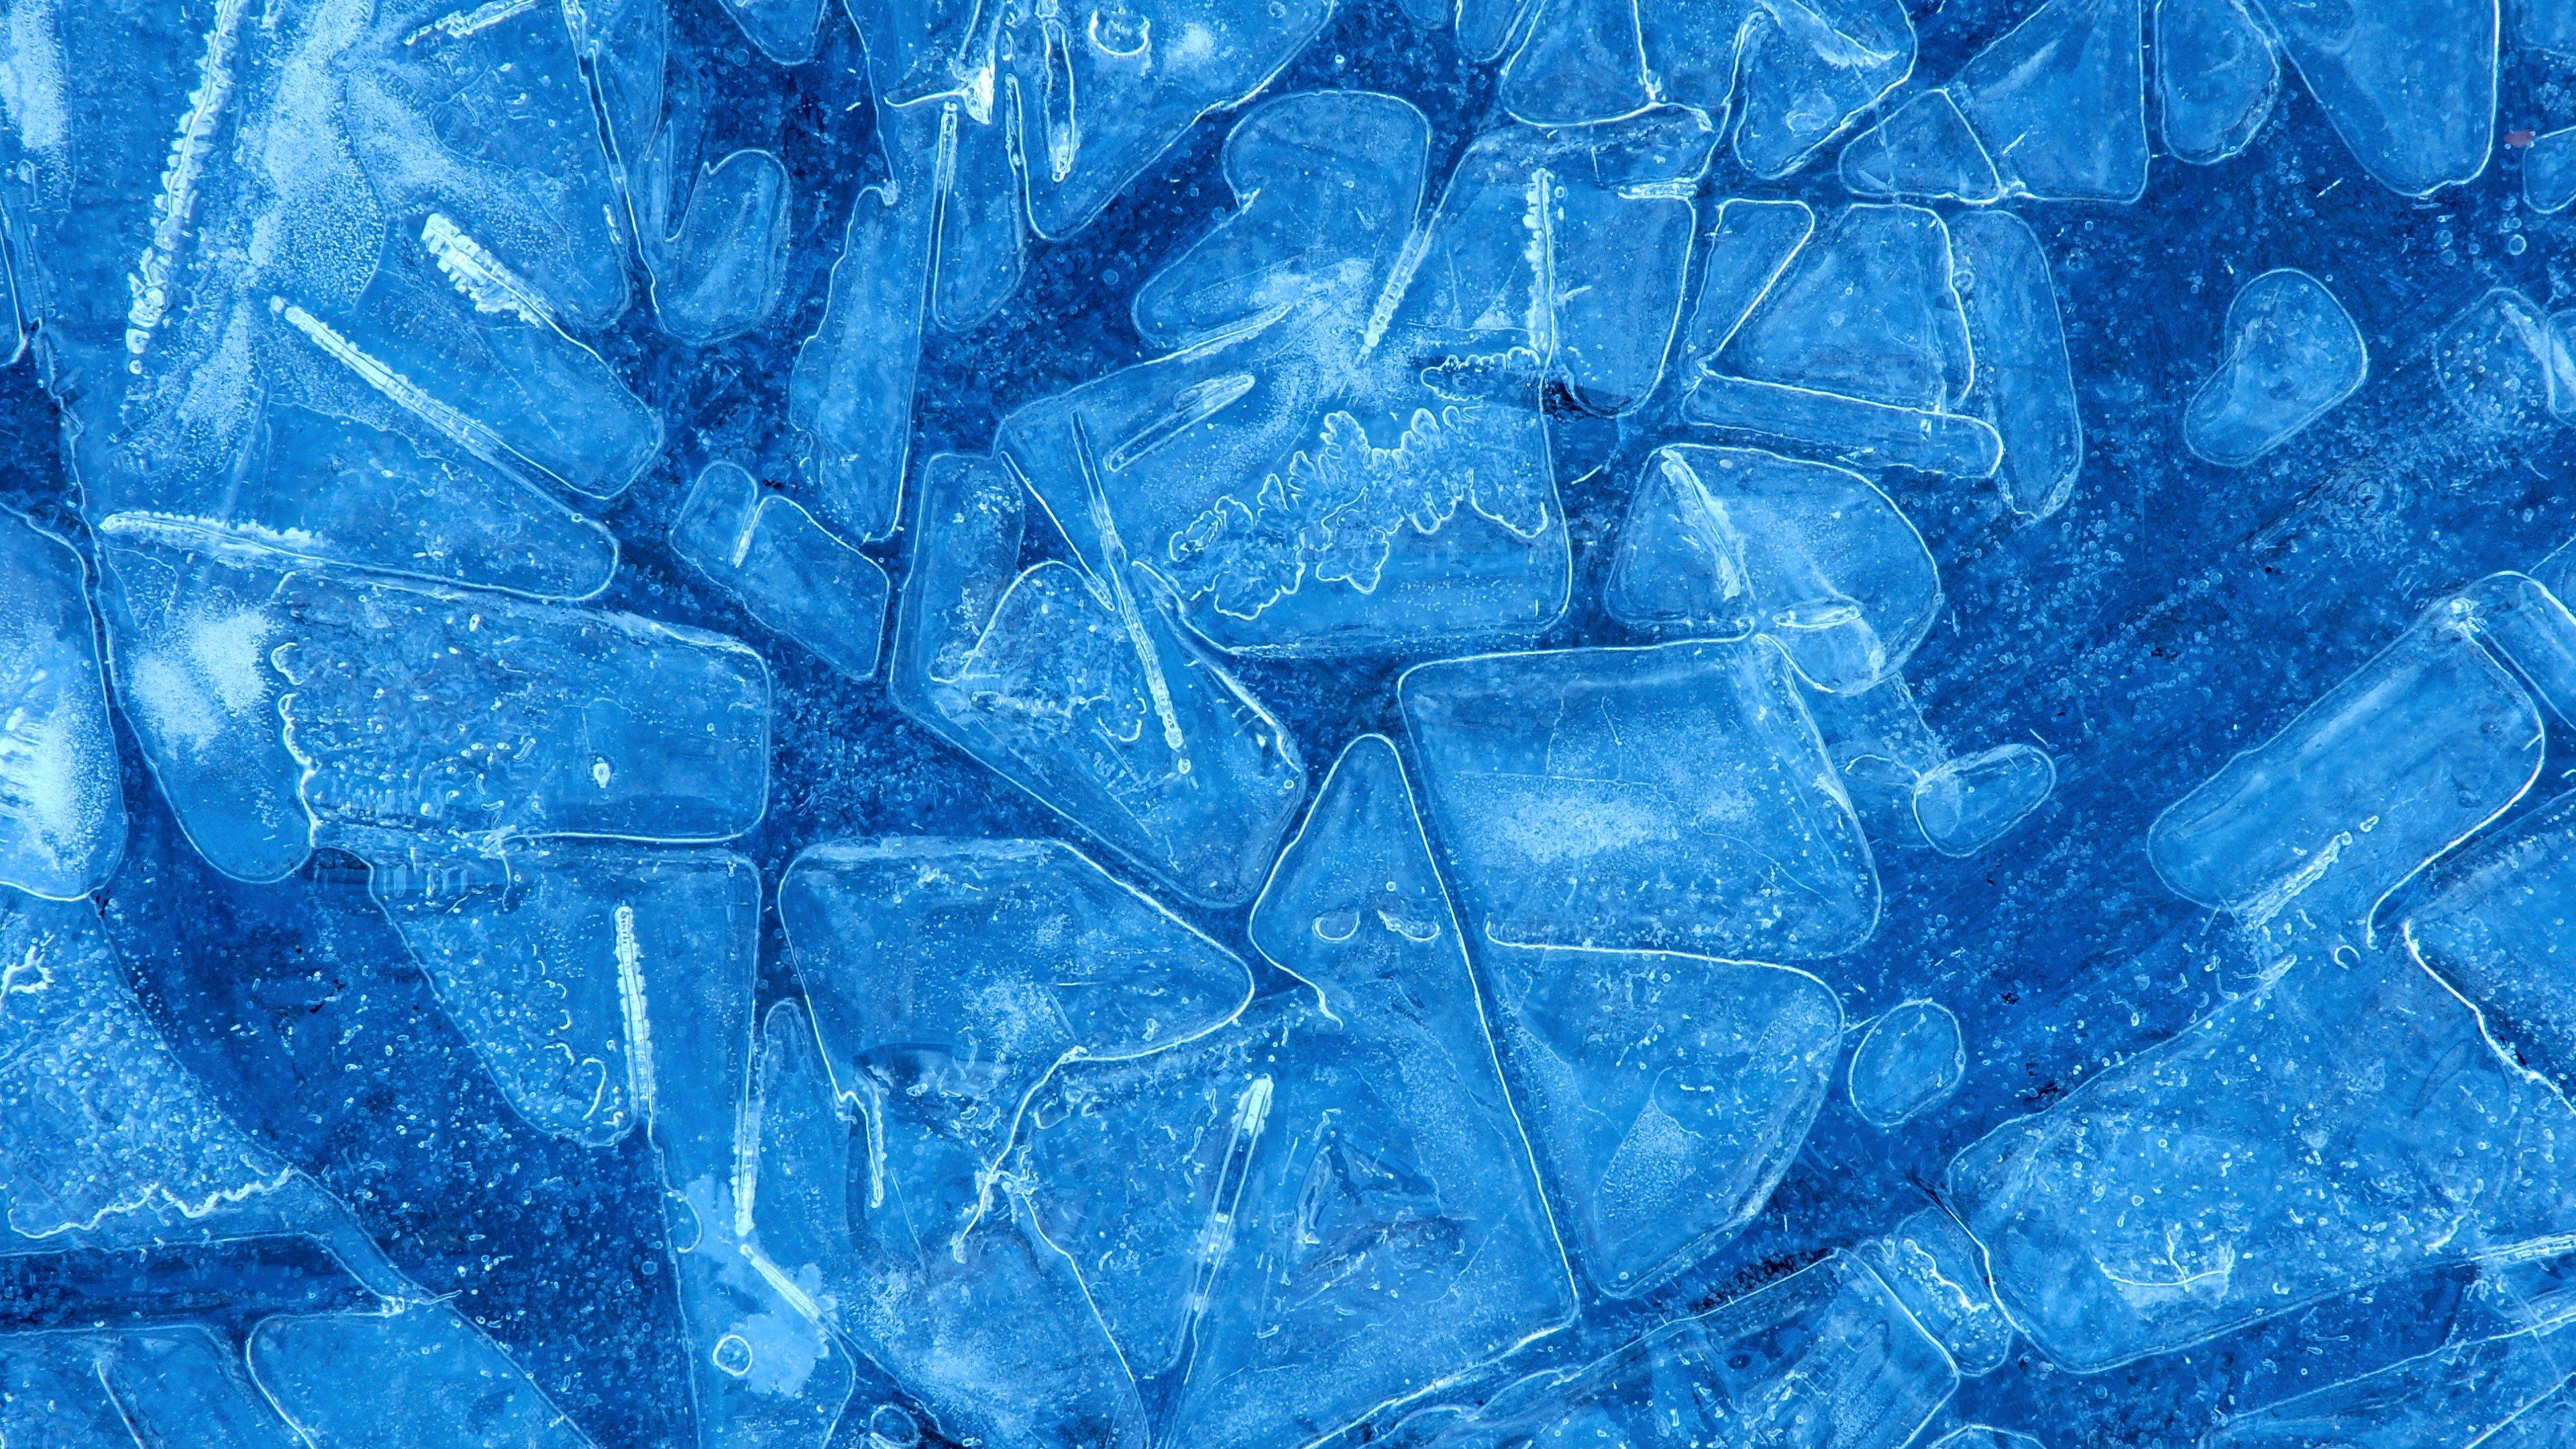 Wallpaper Blue ice